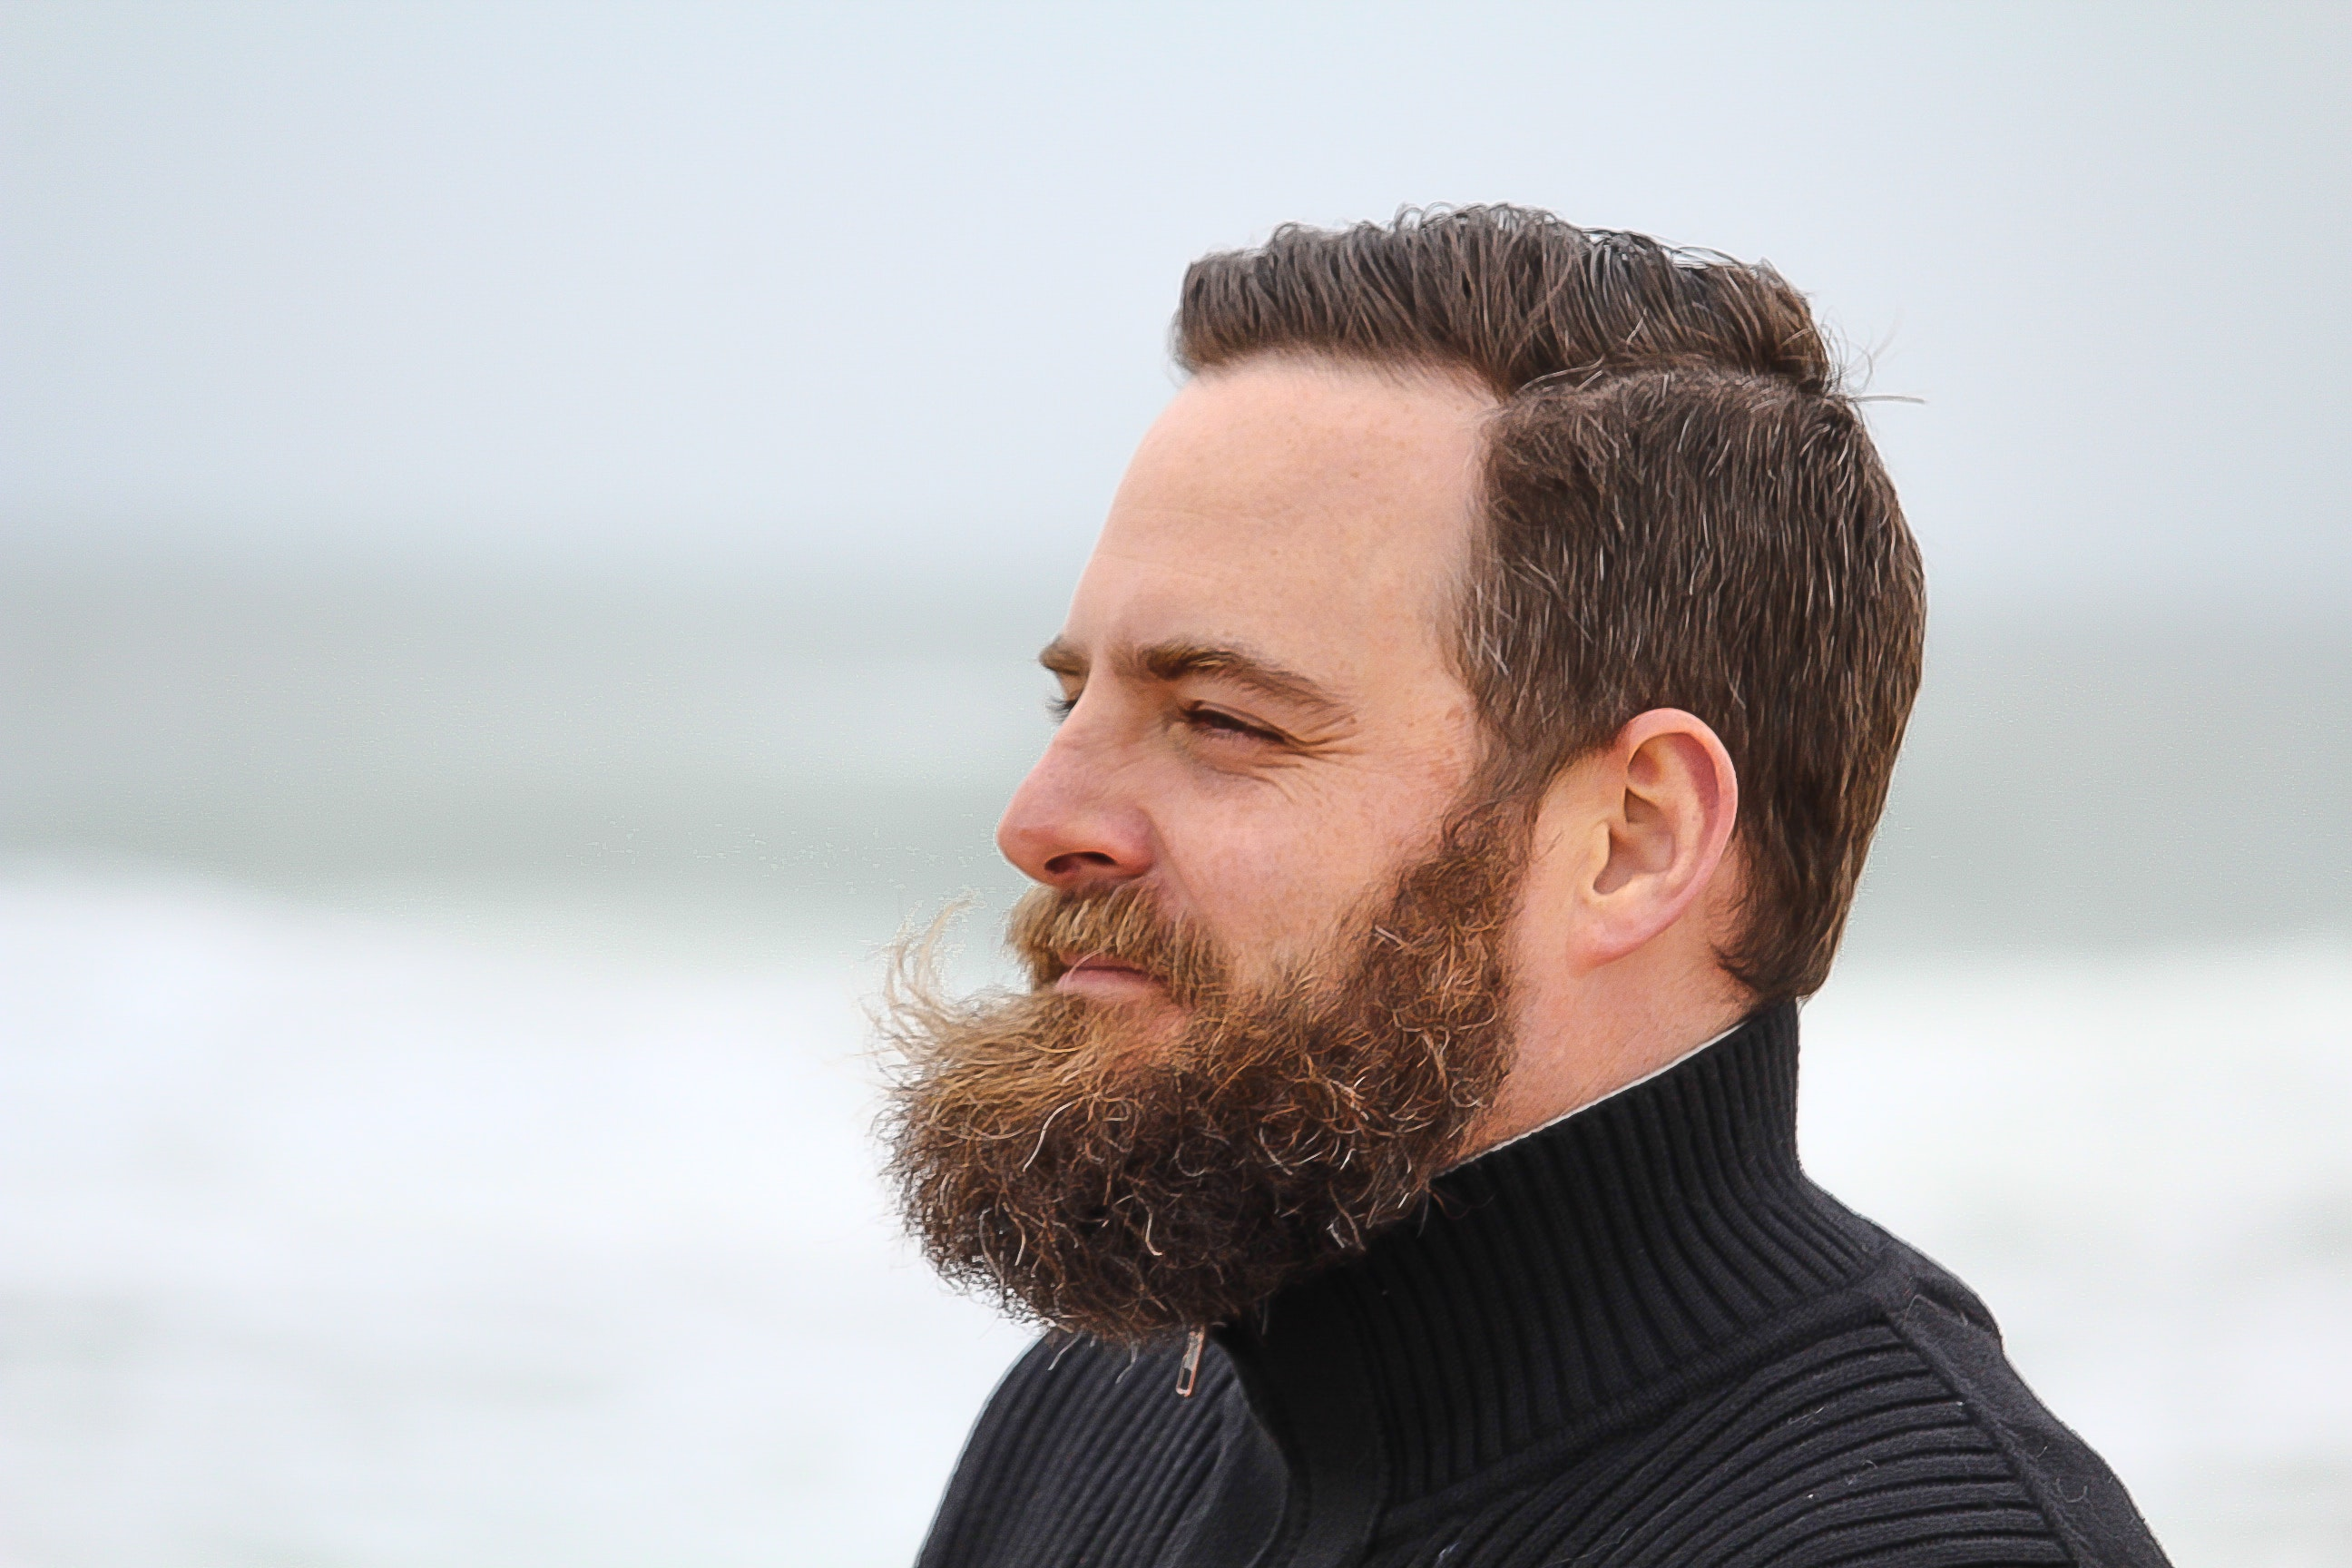 Bearded Man Wearing Black Knit Cap 183 Free Stock Photo